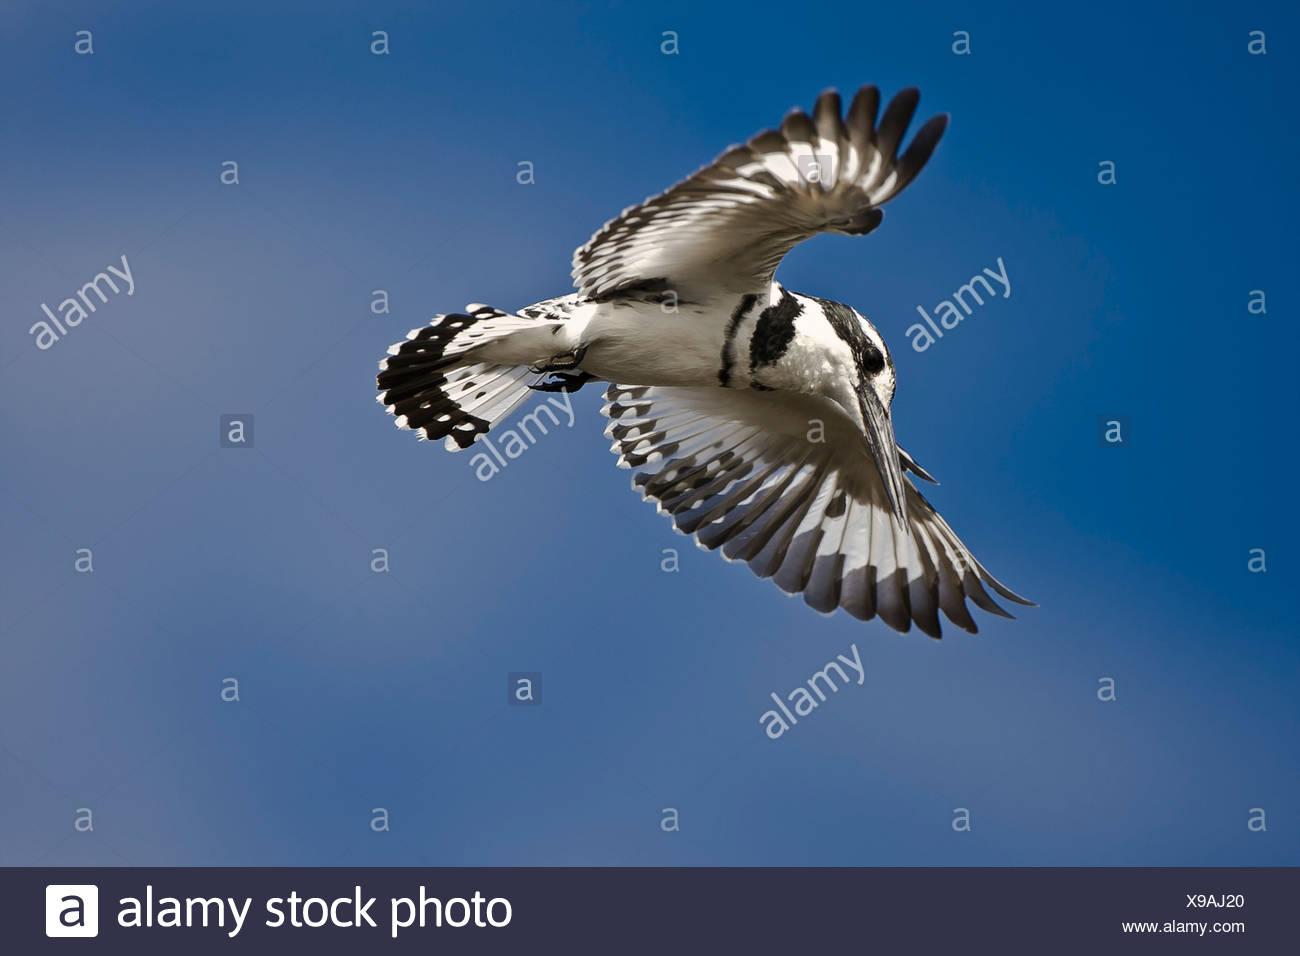 Pied Kingfisher, Masai Mara, Kenya Stock Photo